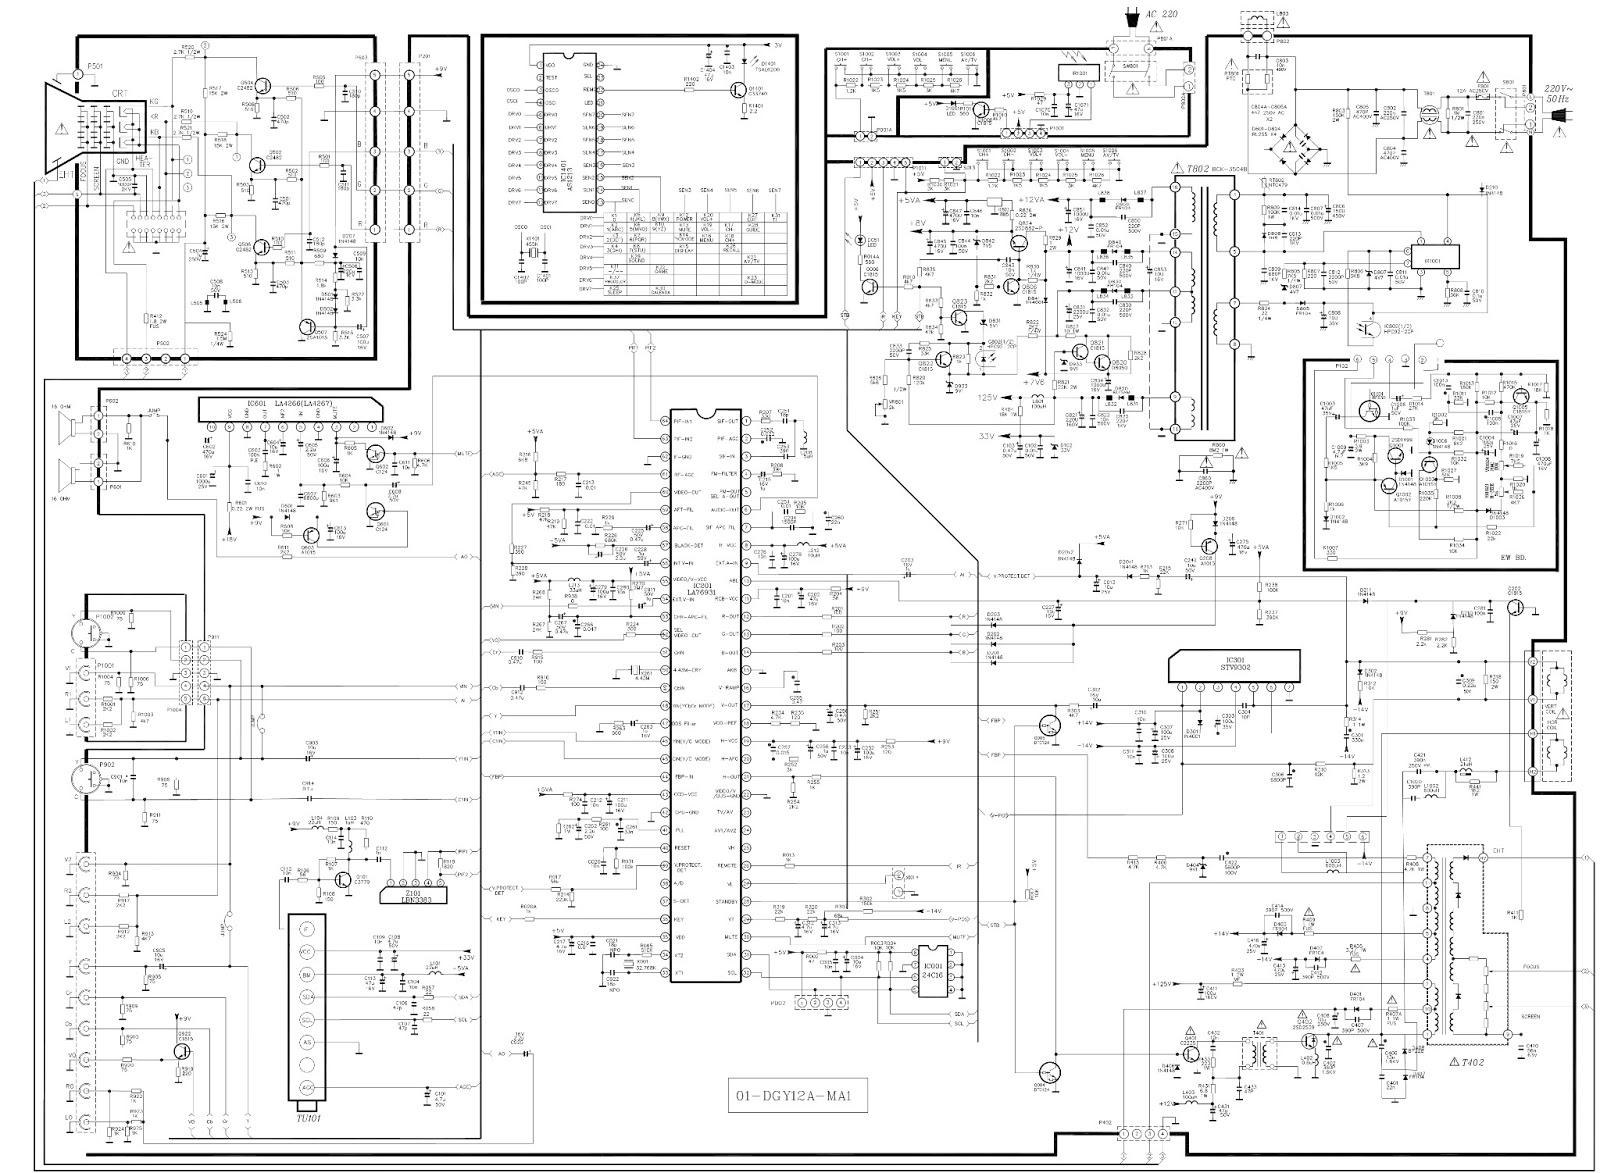 tcl14175 schematic diagram